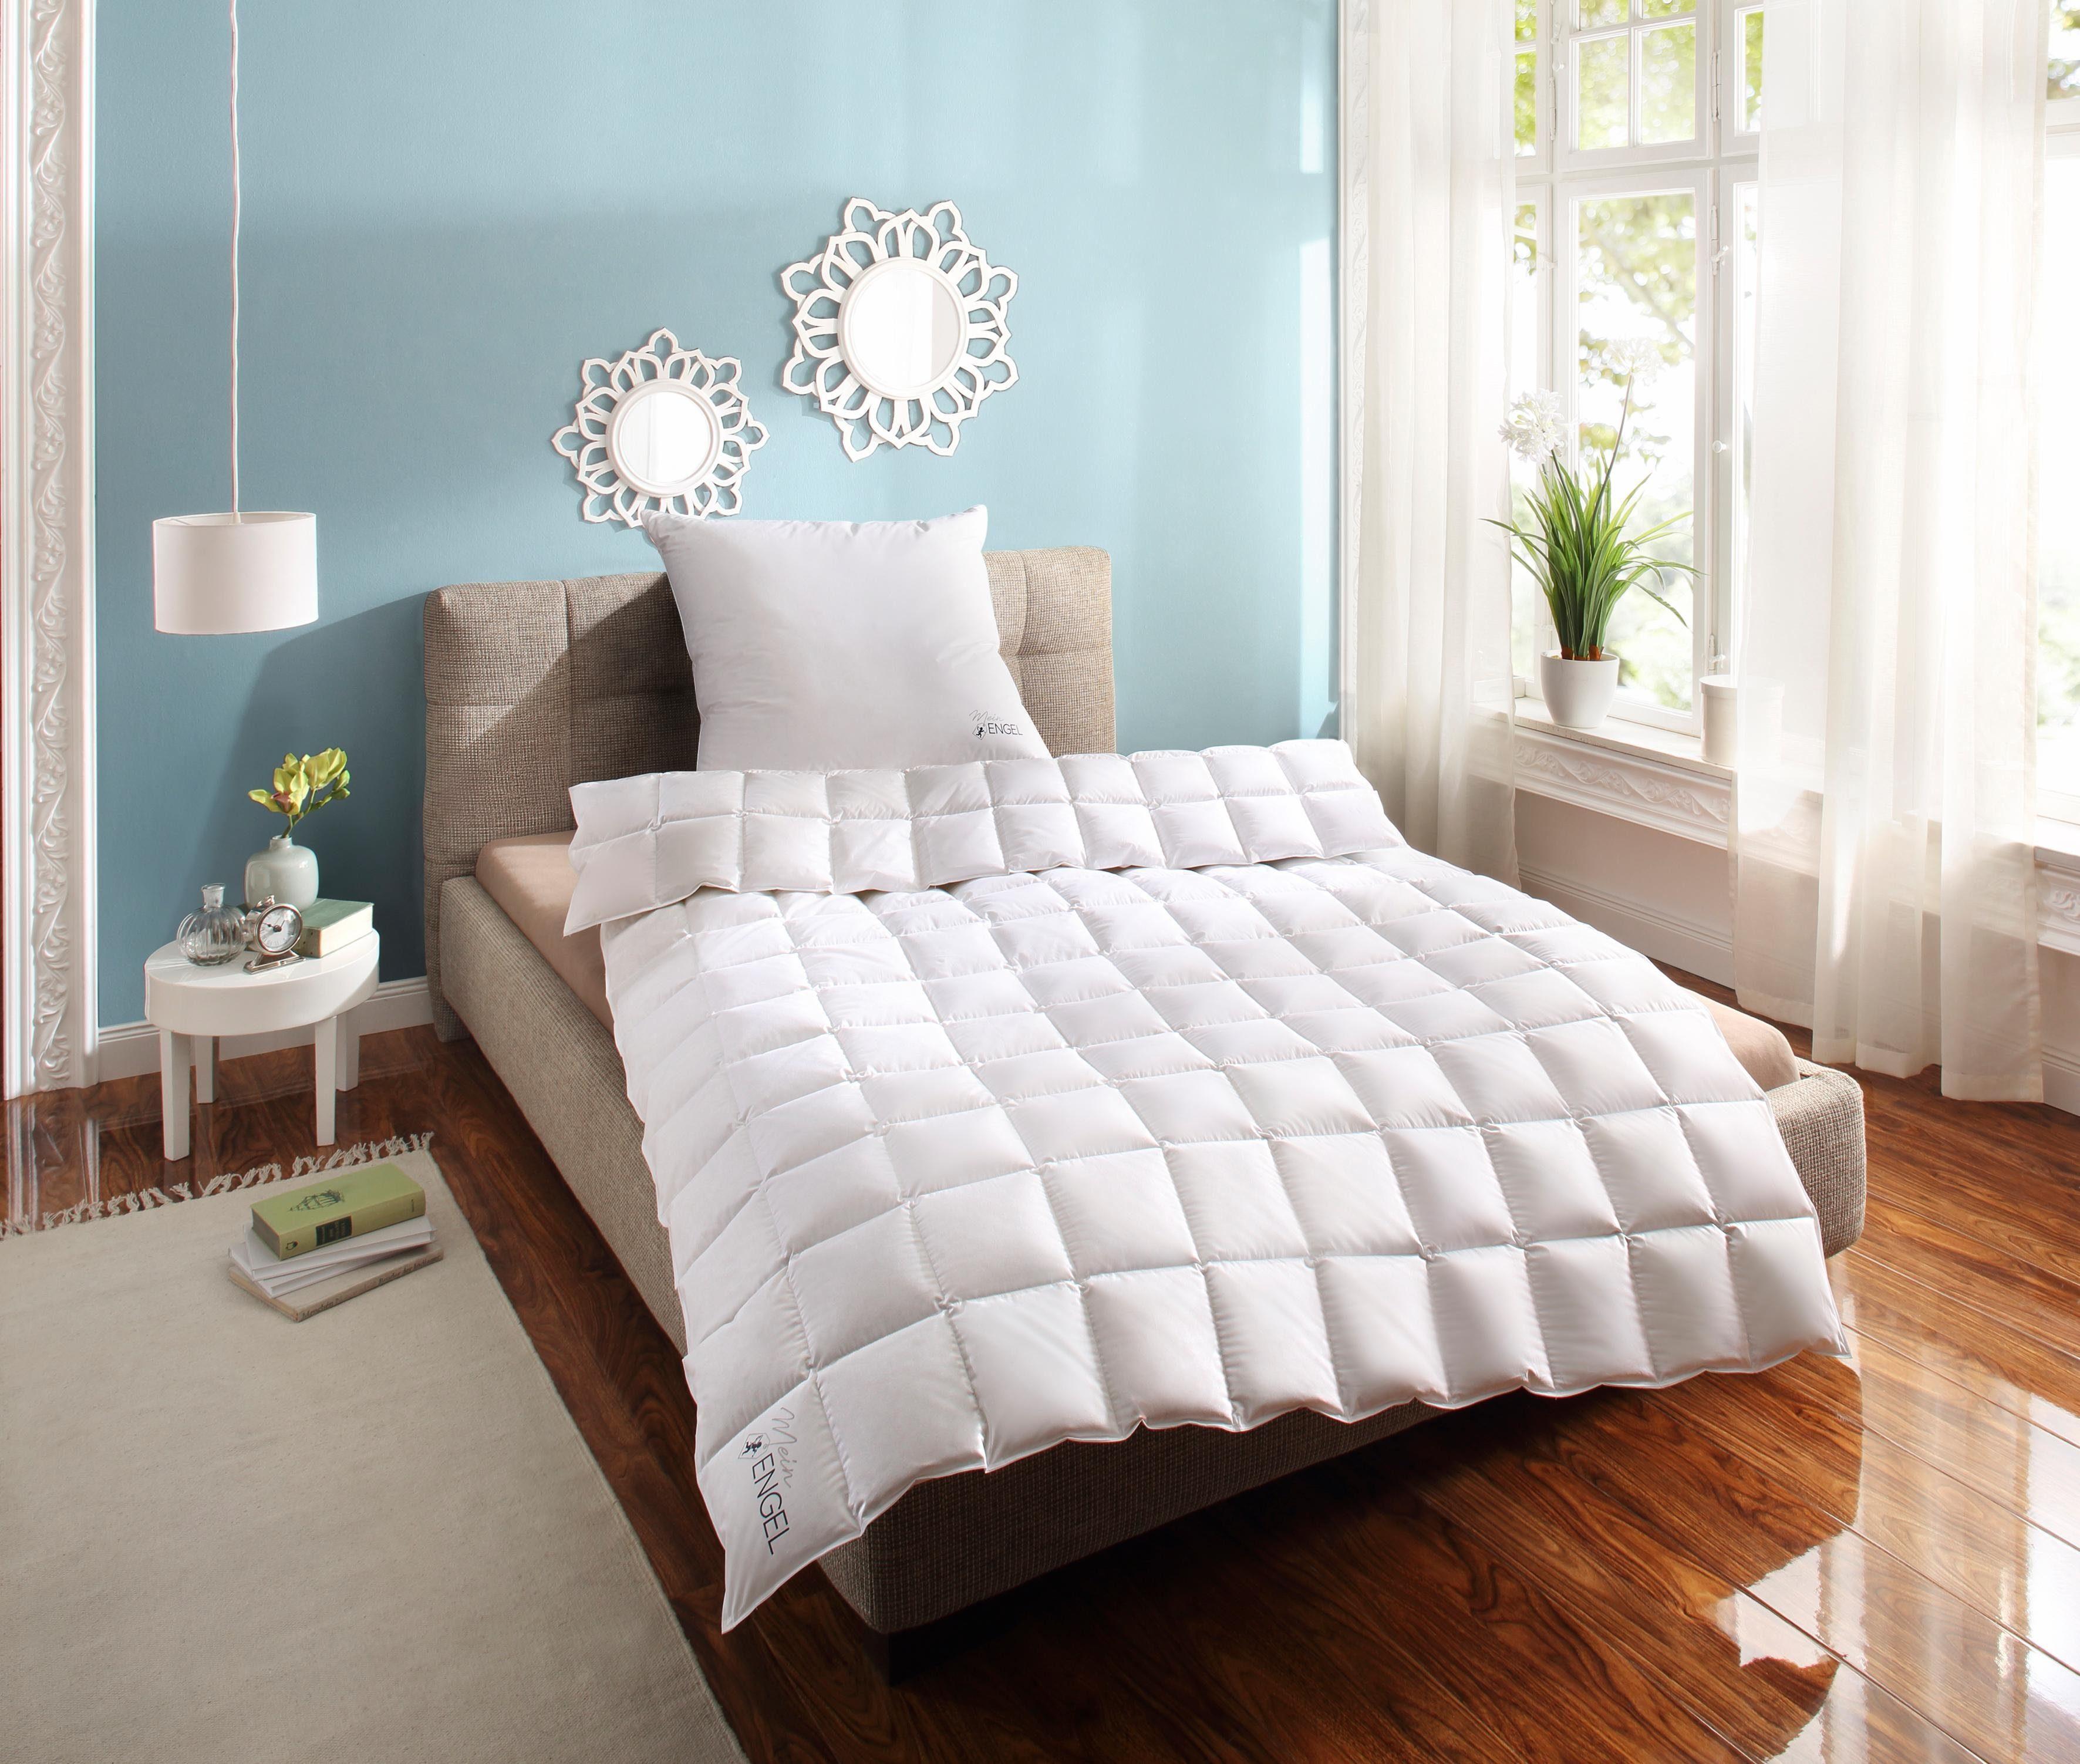 Daunenbettdecke, »Mein Engel«, Schlafstil, leicht, Füllung: 100% Gänsedaunen, Bezug: 100% Baumwolle, (1-tlg)